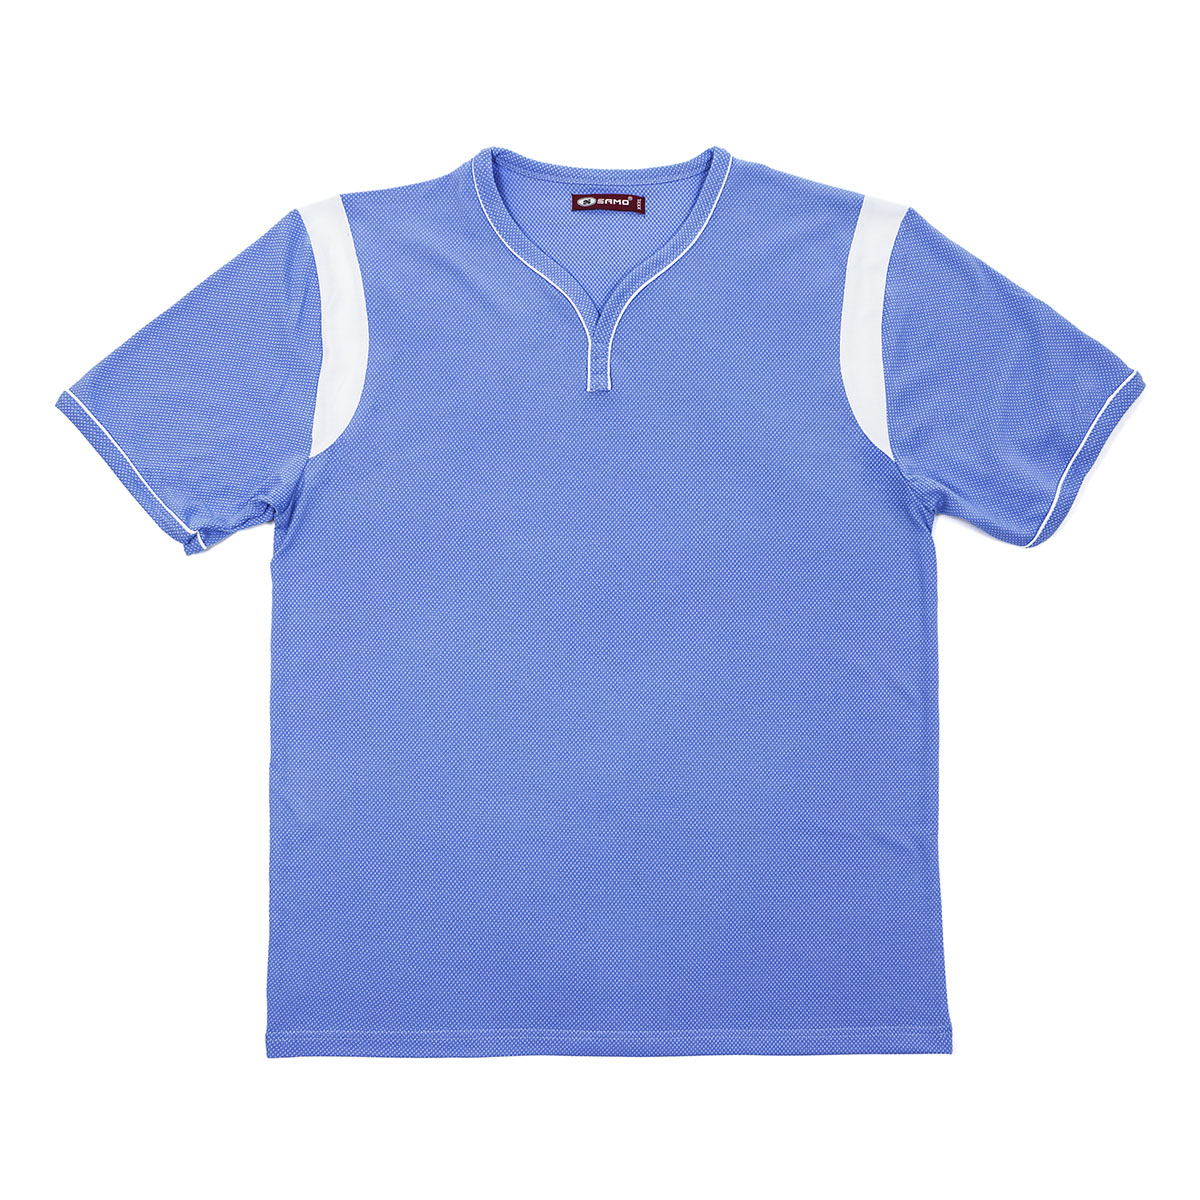 Мужская футболка Samo арт. 0703, размер 48Майки и футболки<br><br><br>Тип: Муж. футболка<br>Размер: 48<br>Материал: Хлопок